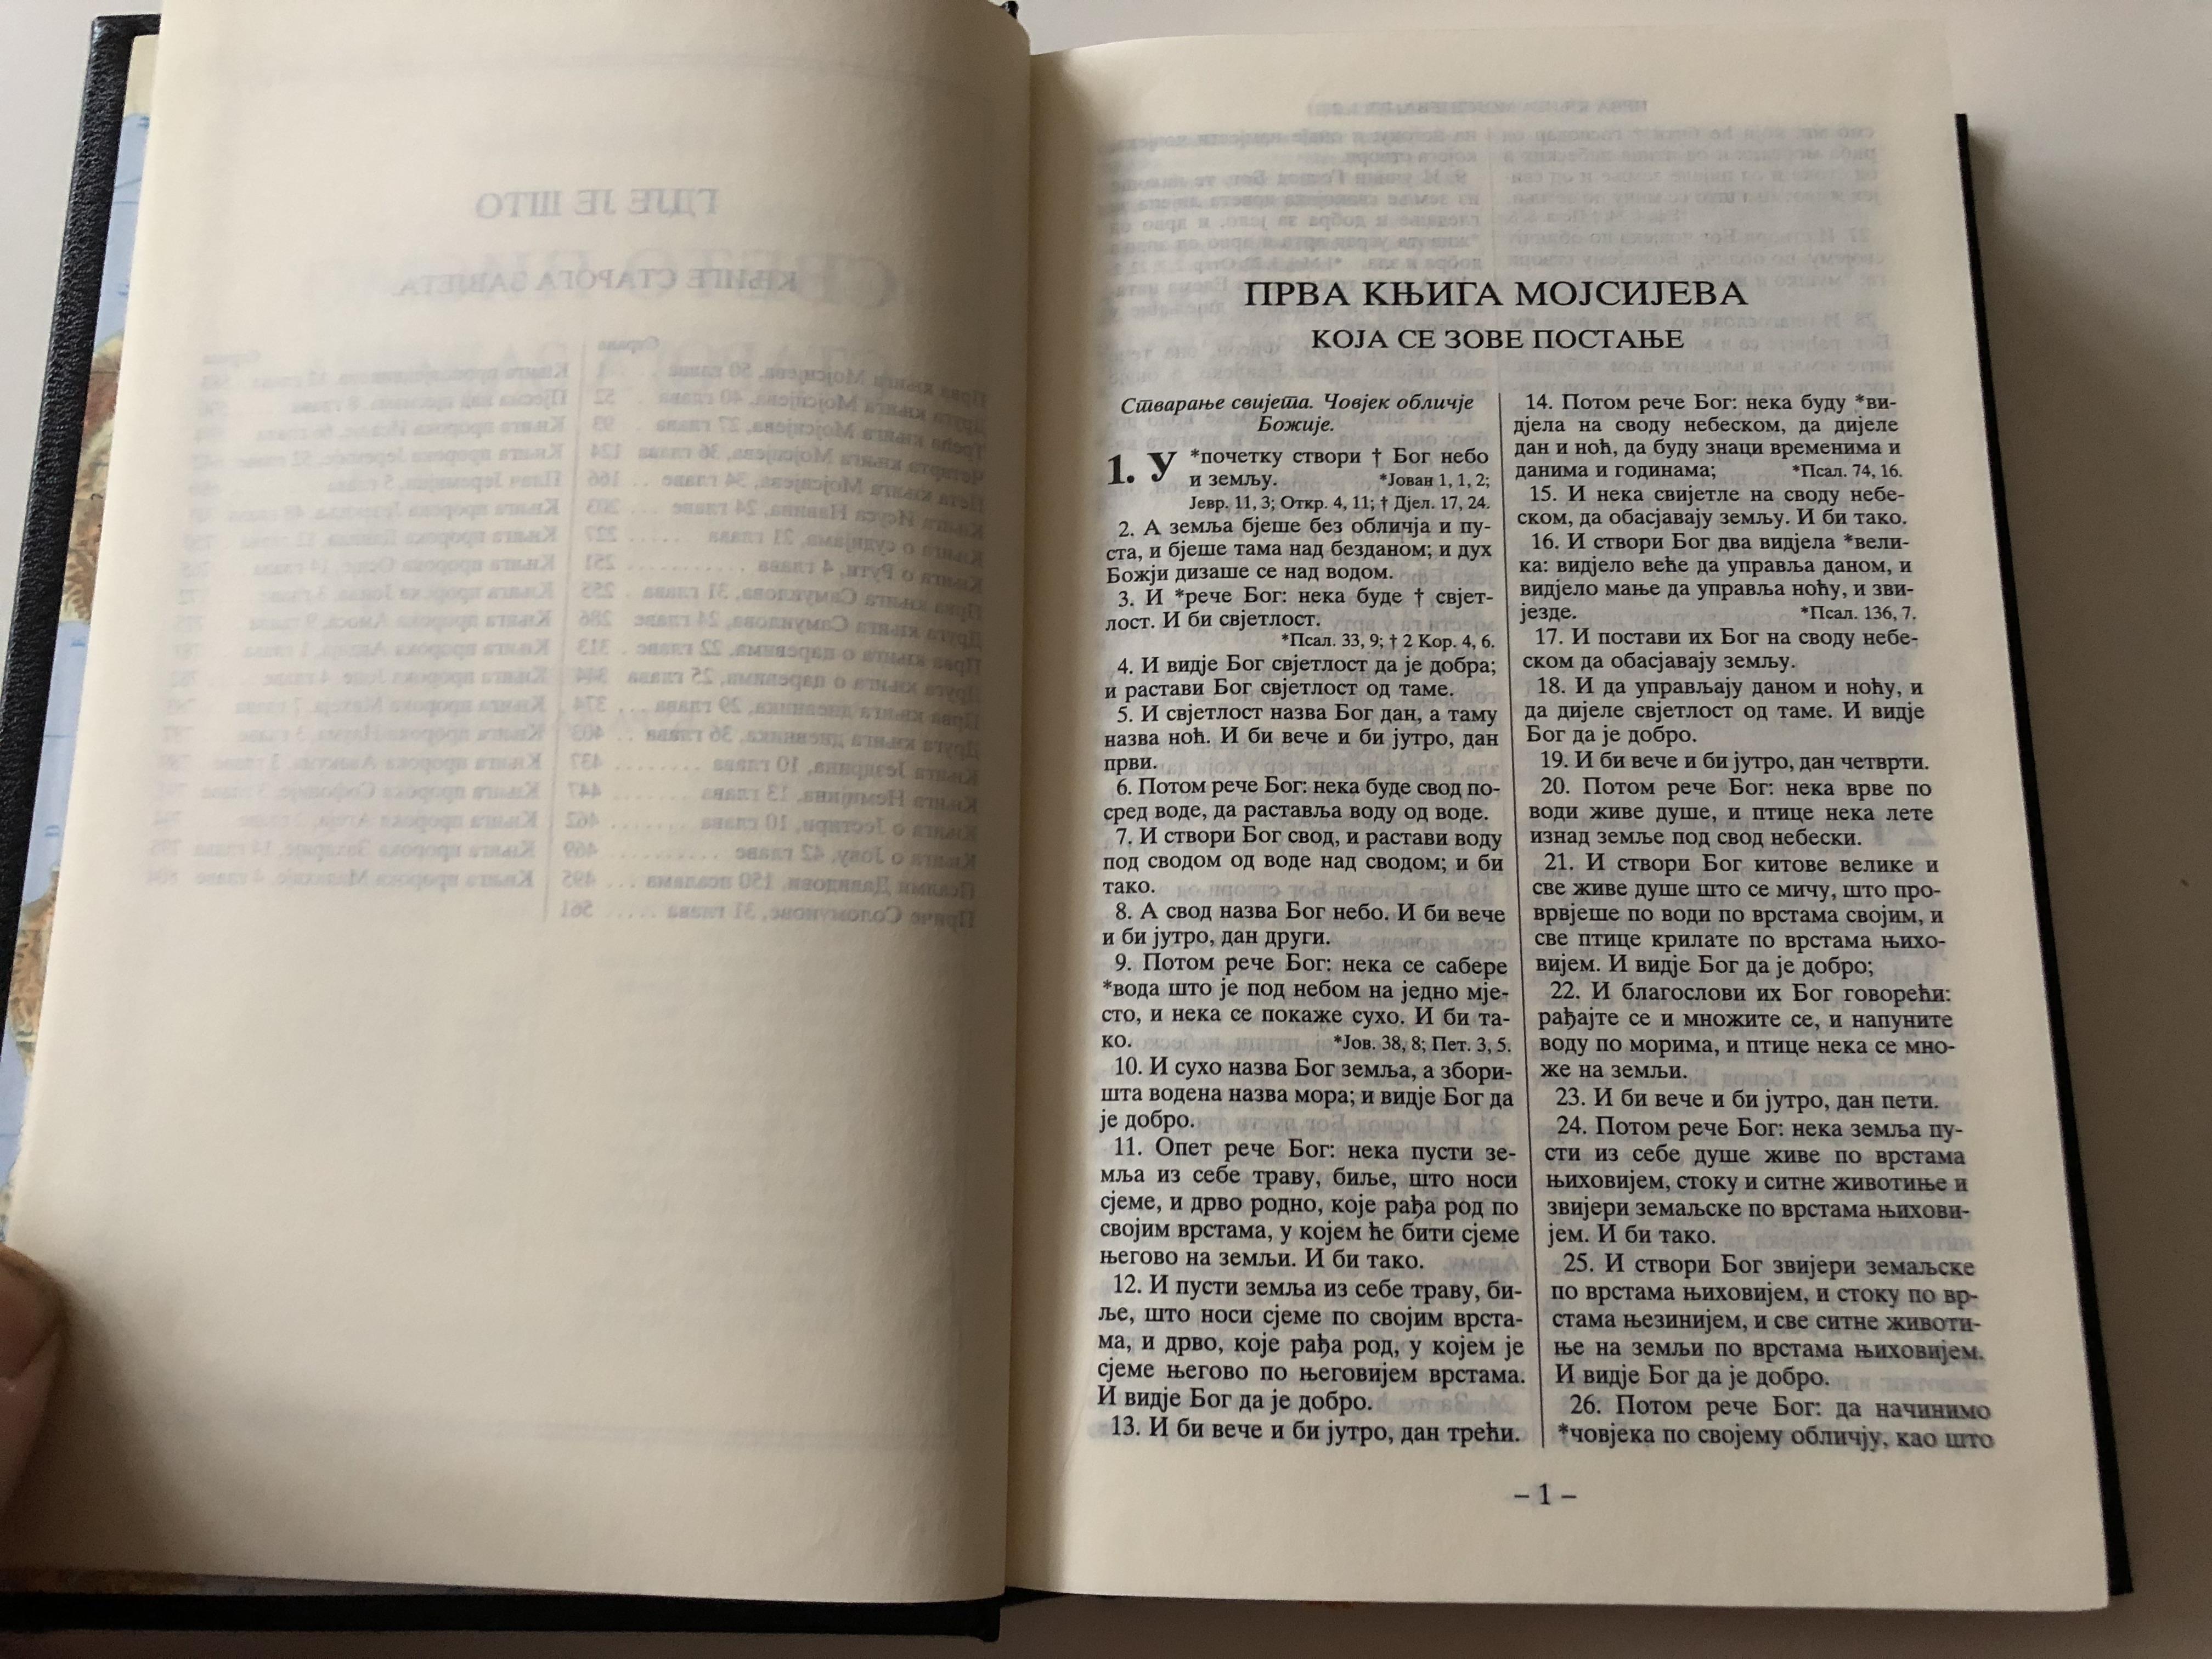 serbian-language-bible-burgundy-cover-with-golden-cross-cyrillic-script-043hs-29-.jpg